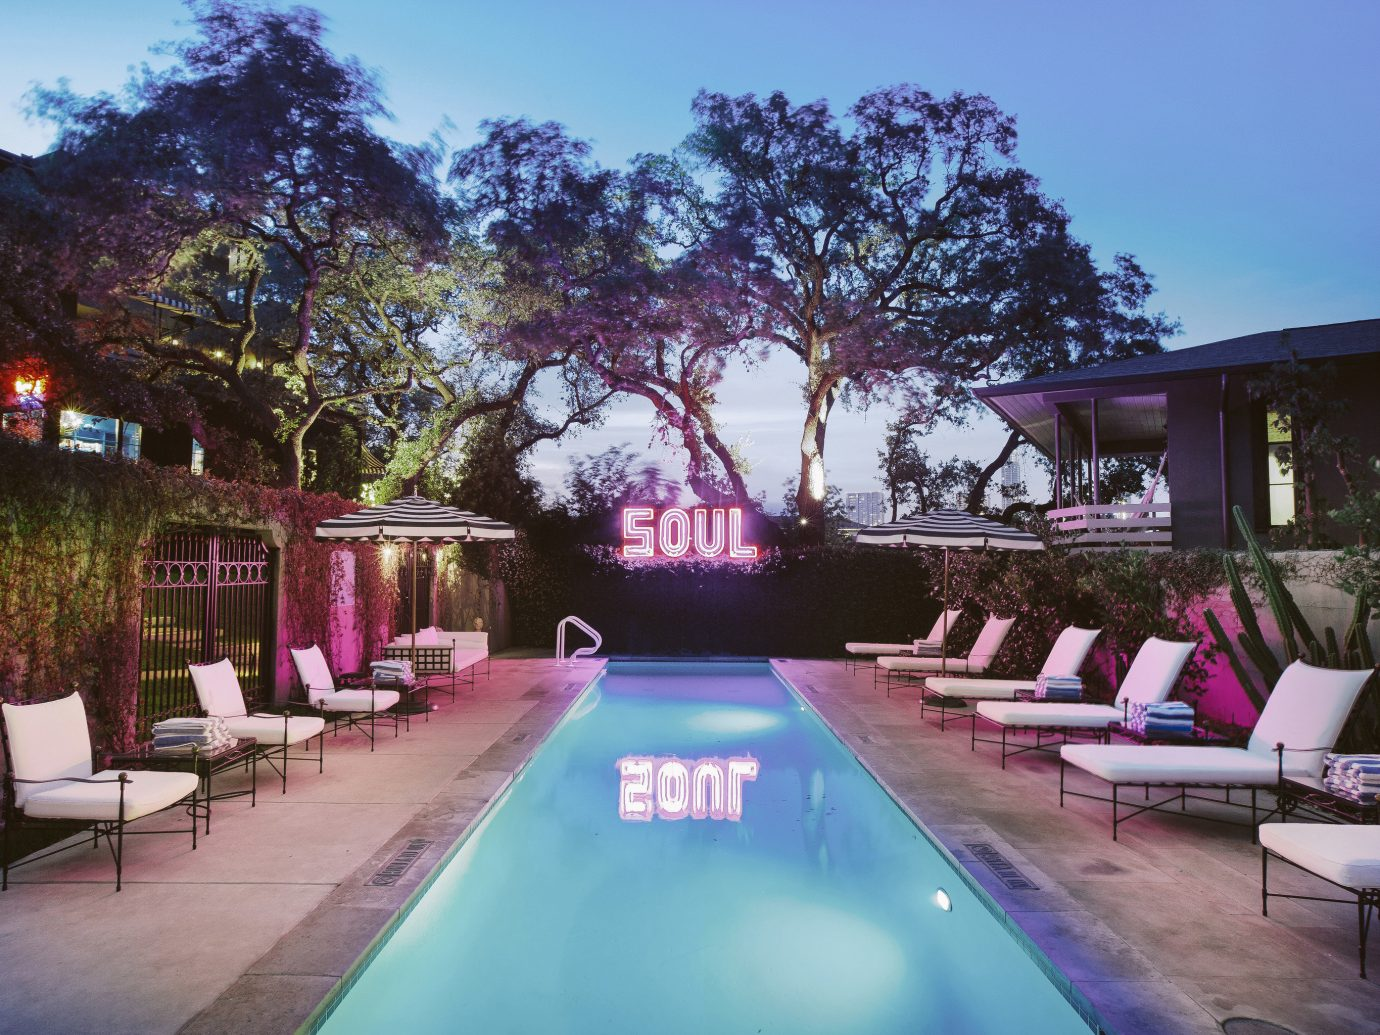 Hotels Trip Ideas tree outdoor sky property swimming pool building estate Resort Villa backyard vacation home hacienda mansion real estate